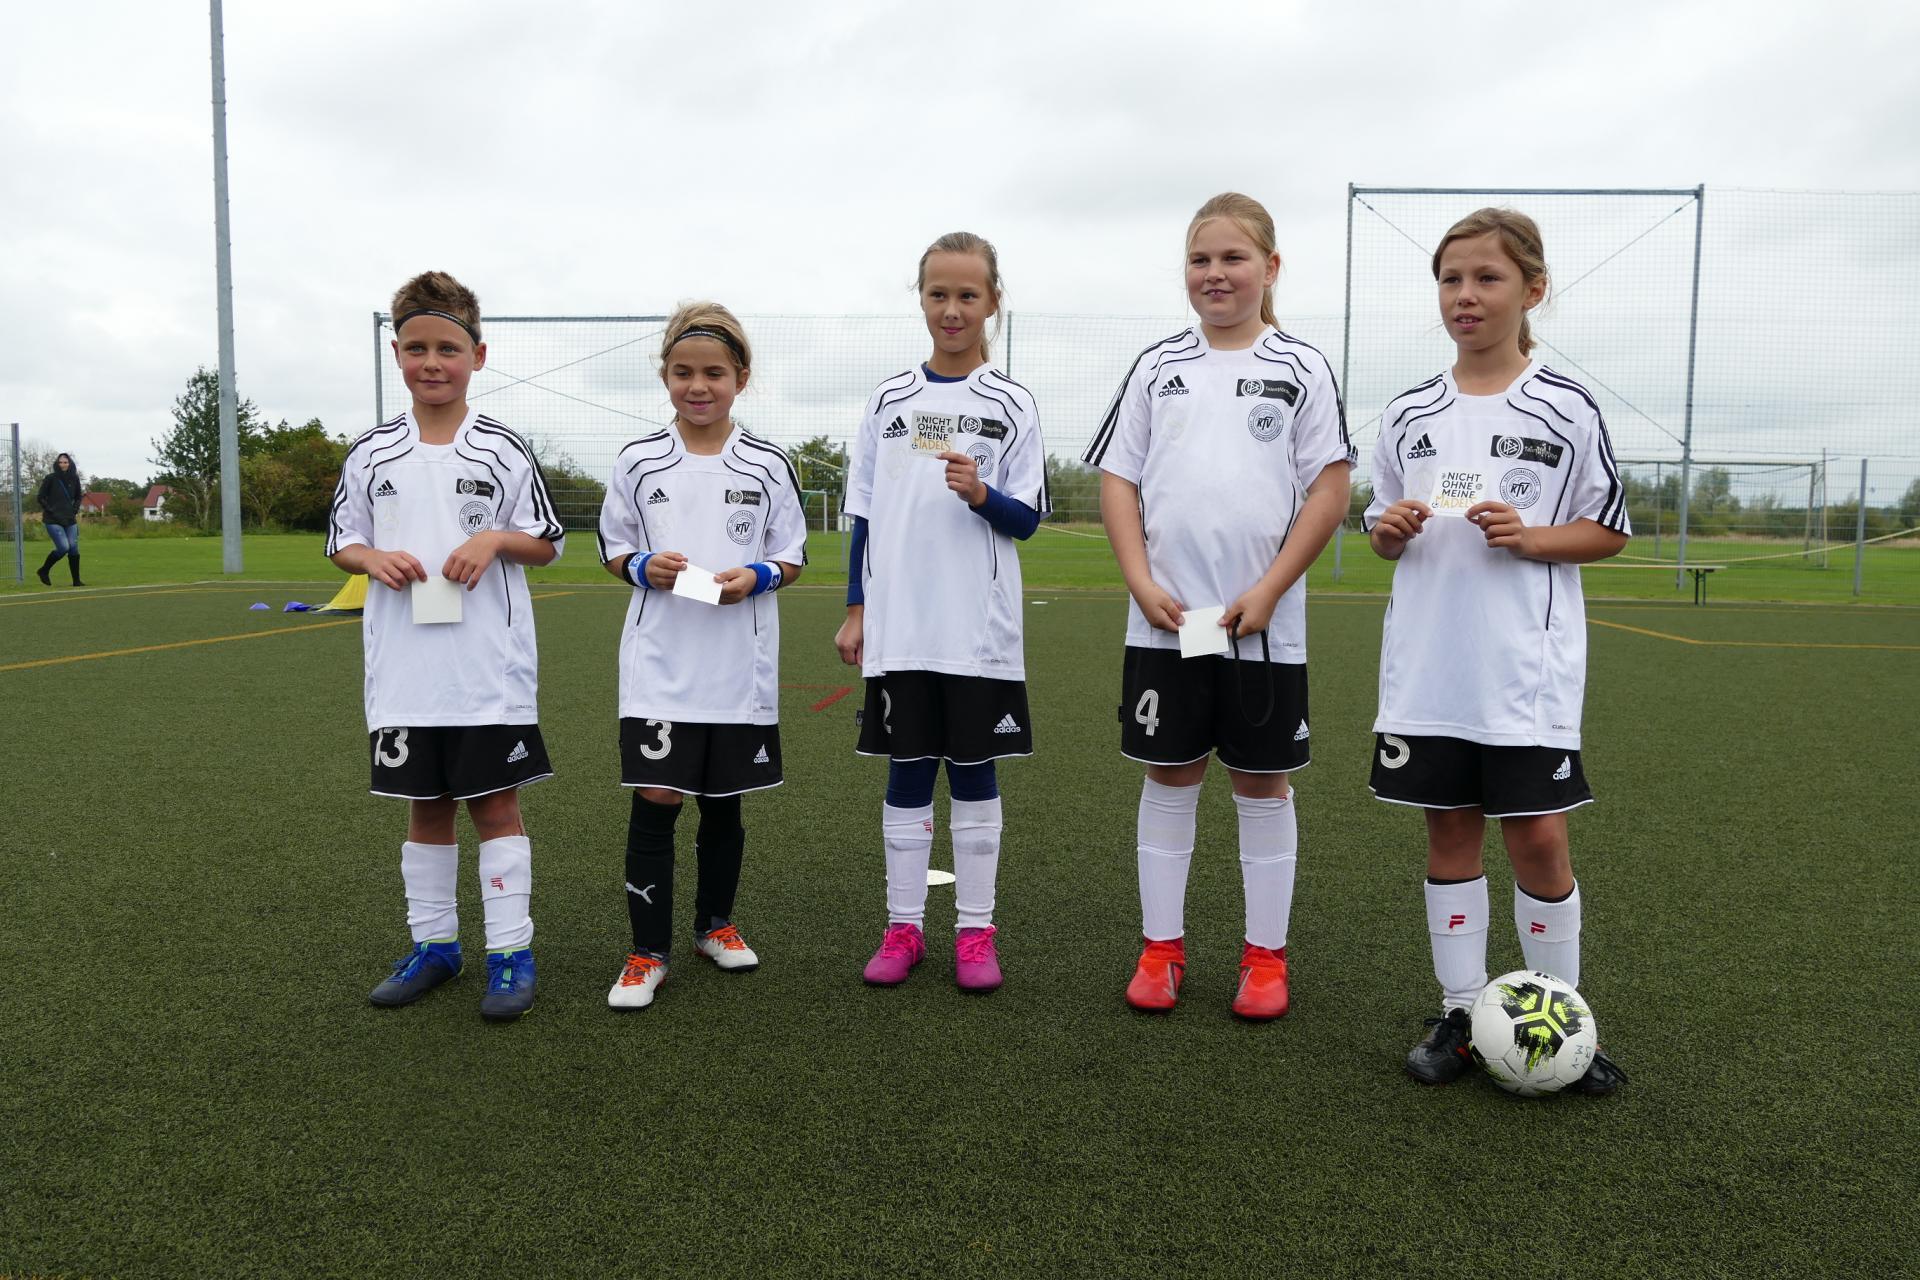 KAW E-Mädchen: Liv, Germaid, Haylie, Frederike, Laura